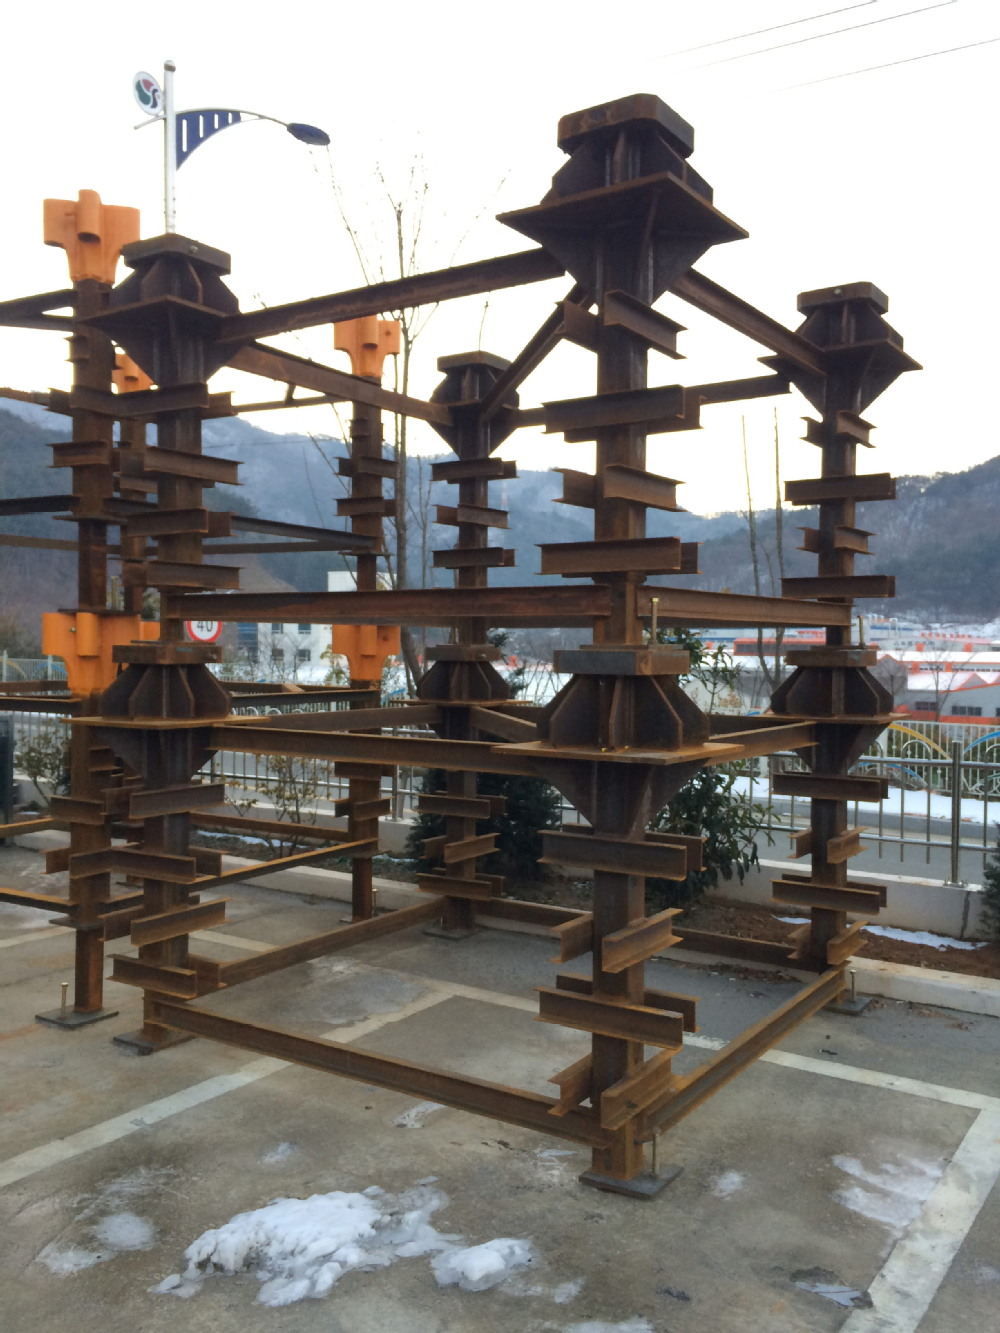 Tower Crane Foundation Anchor (liebherr) - Buy Tower Crane Anchor Liebherr Product on Alibaba.com